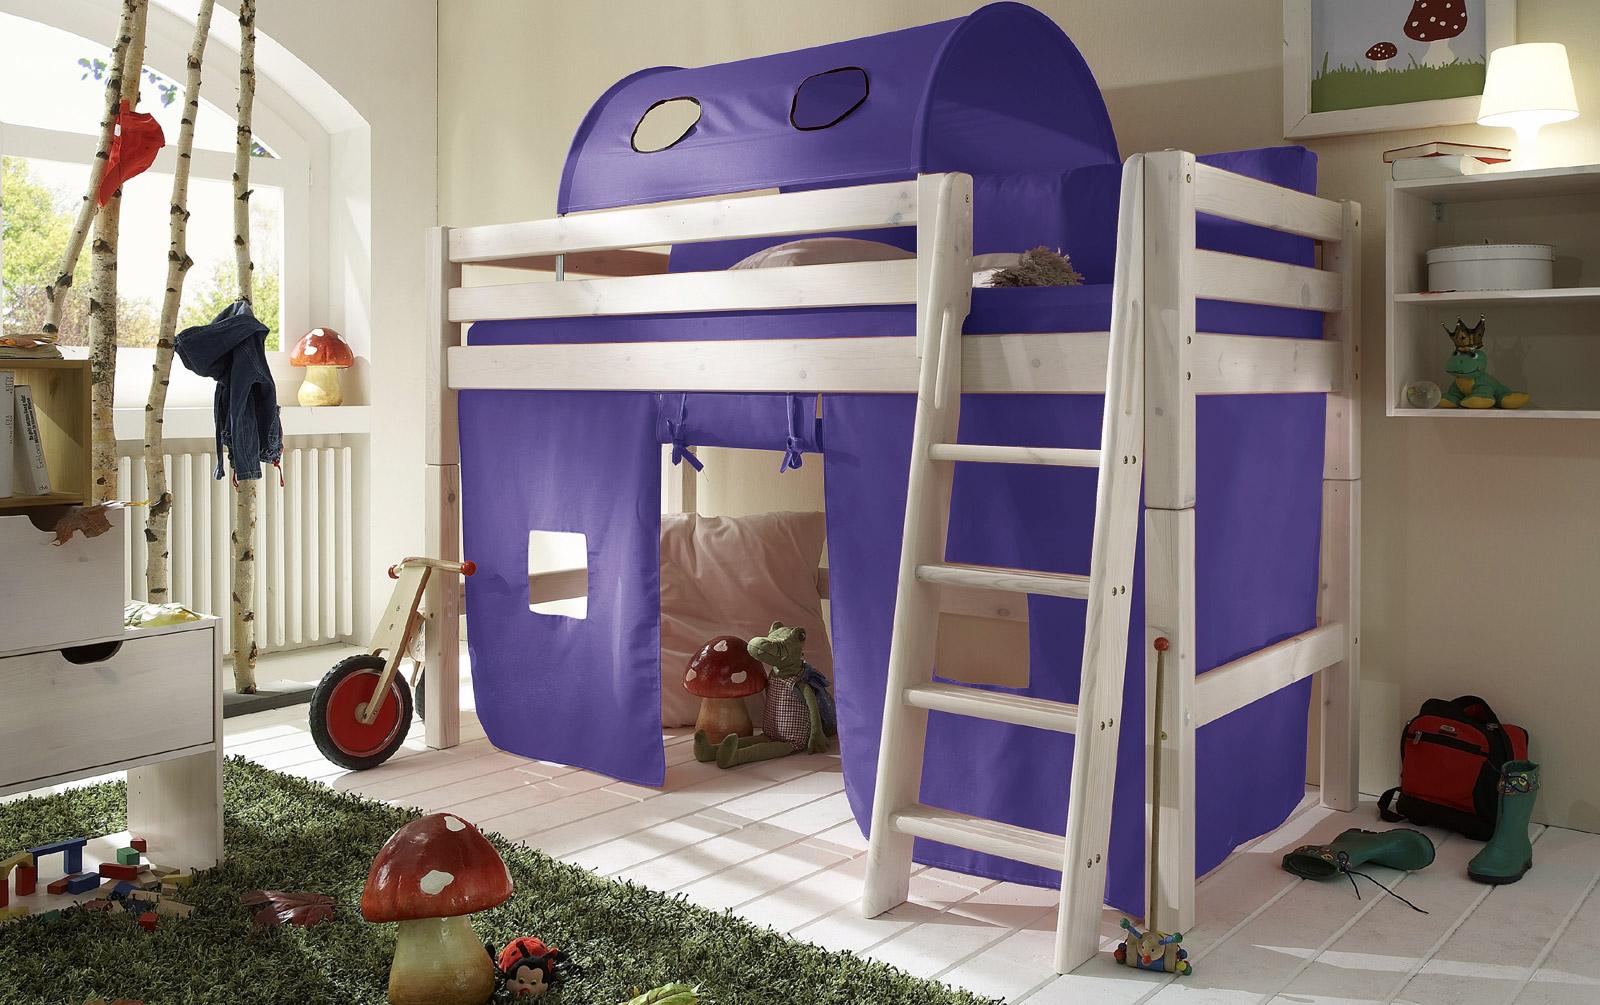 Spielvorhang Kids Paradise für Midi-Betten in uni lila